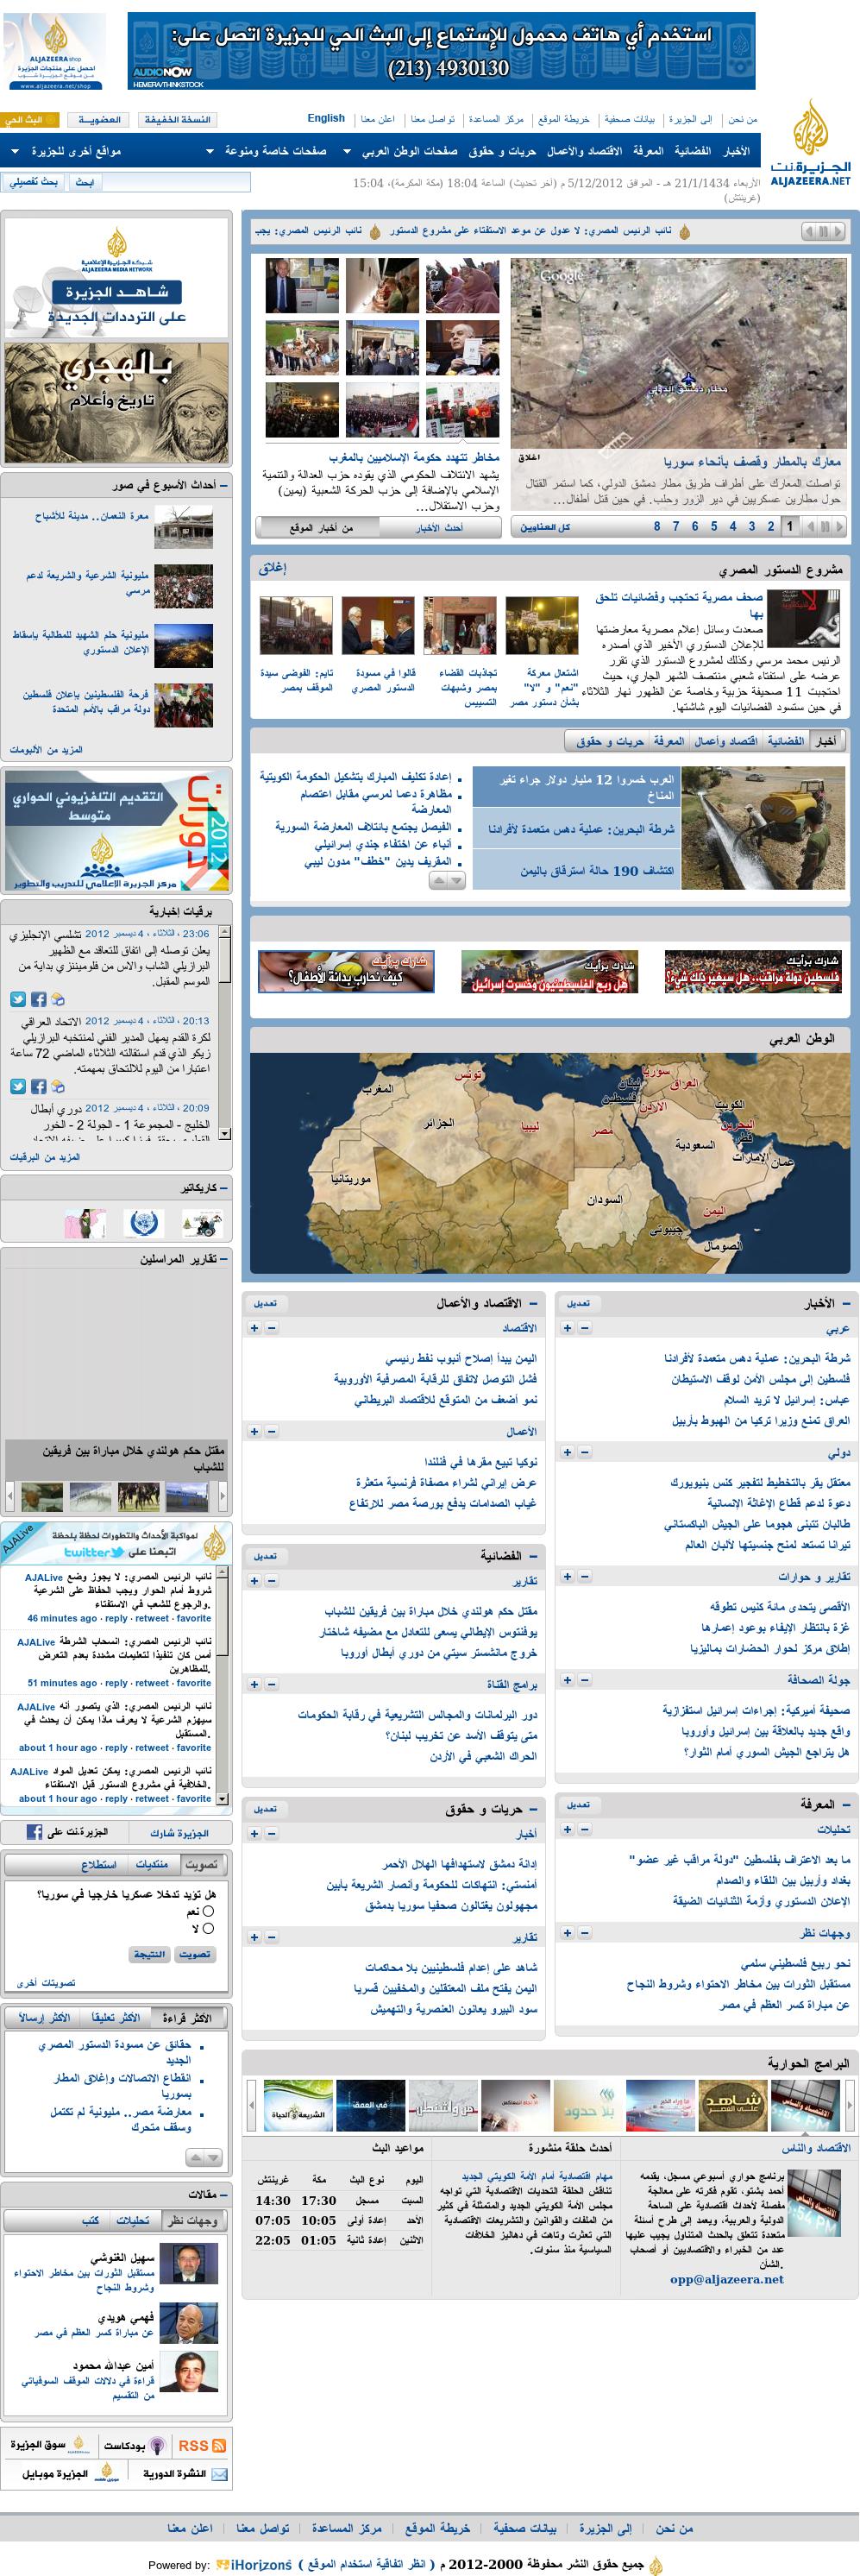 Al Jazeera at Wednesday Dec. 5, 2012, 3:22 p.m. UTC